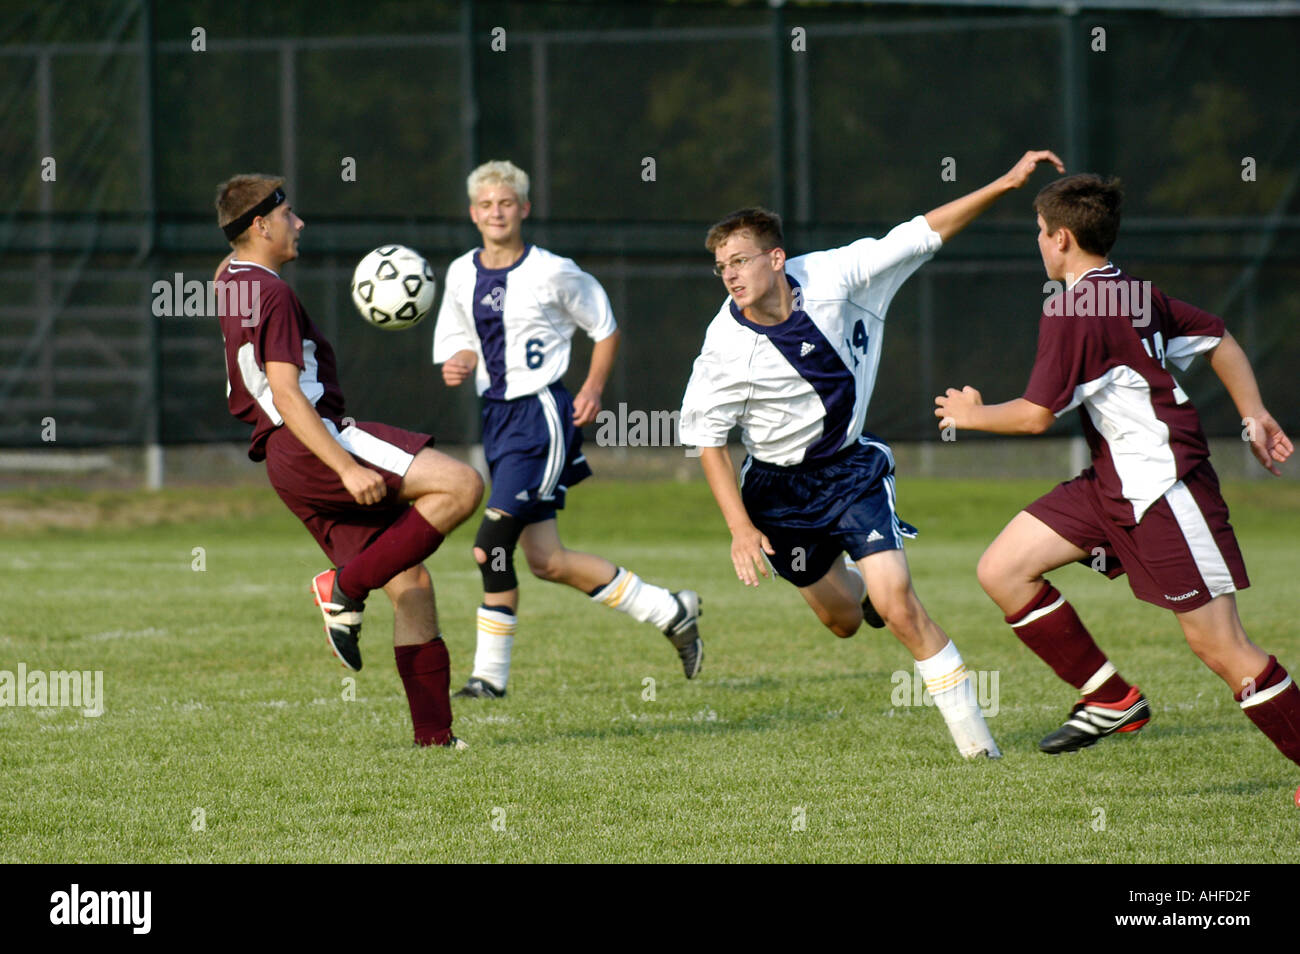 High School Football Soccer Action - Stock Image